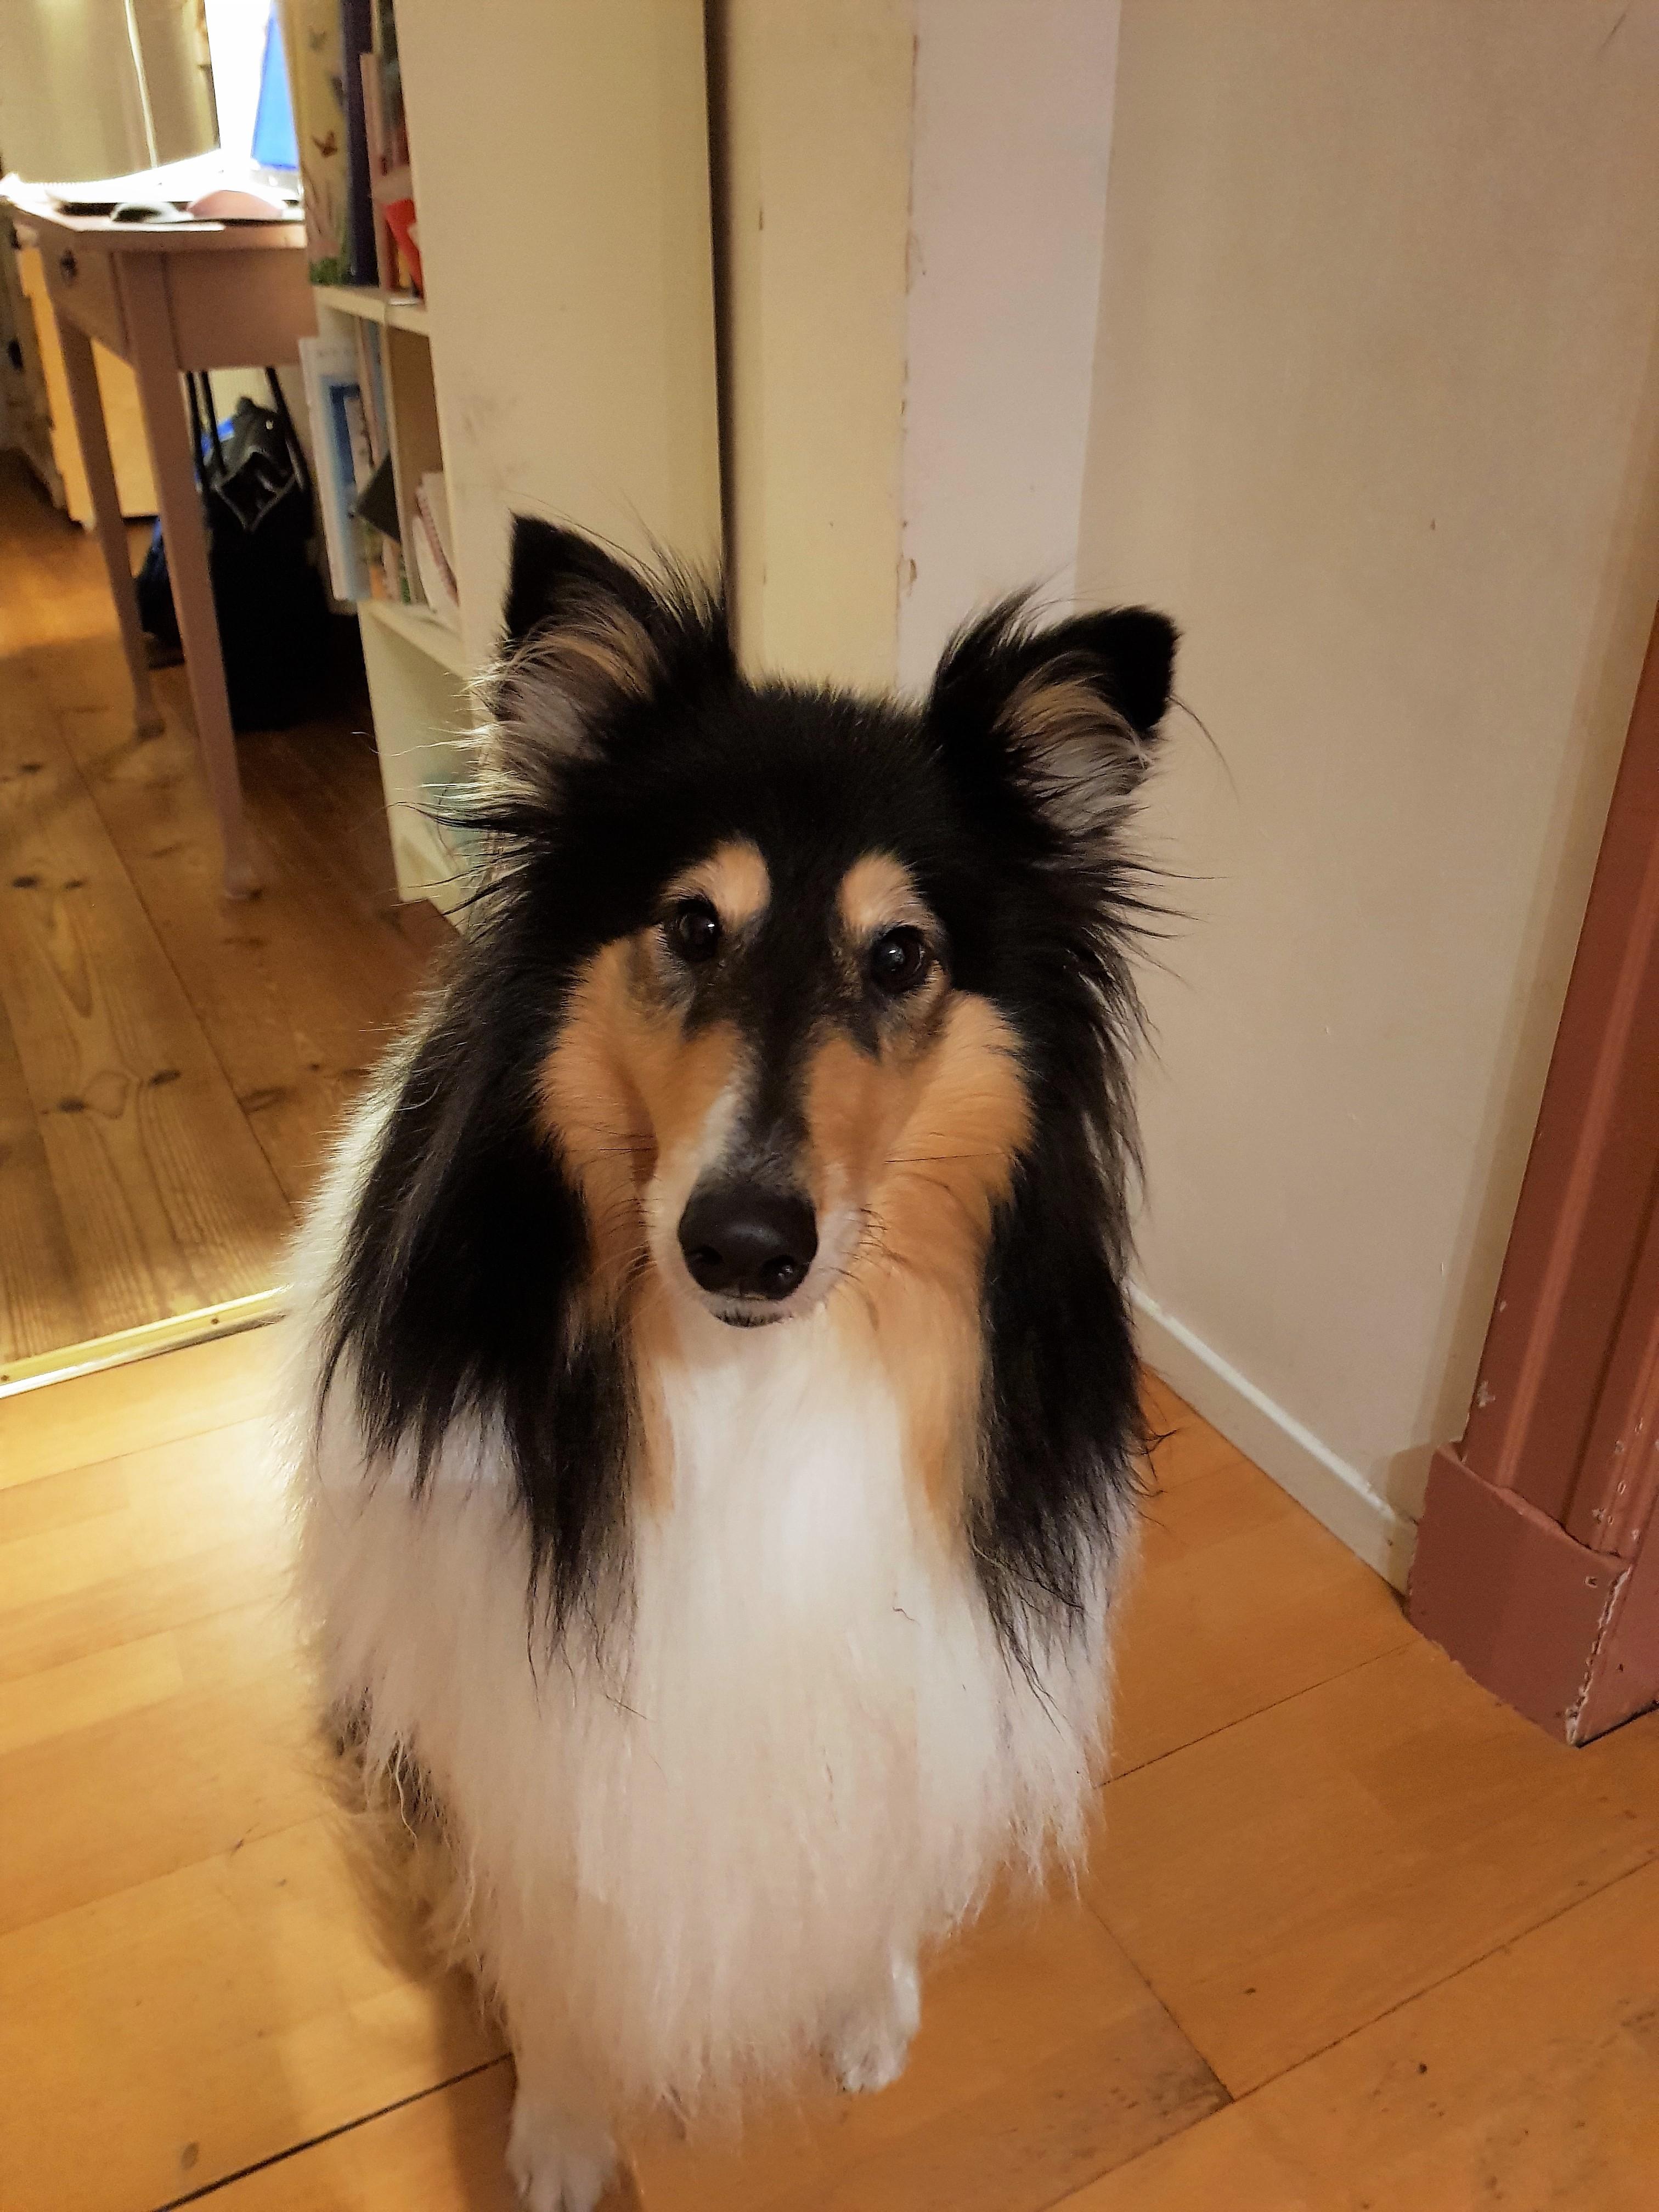 Veterinärens hund, Tess, en trefärgad collie